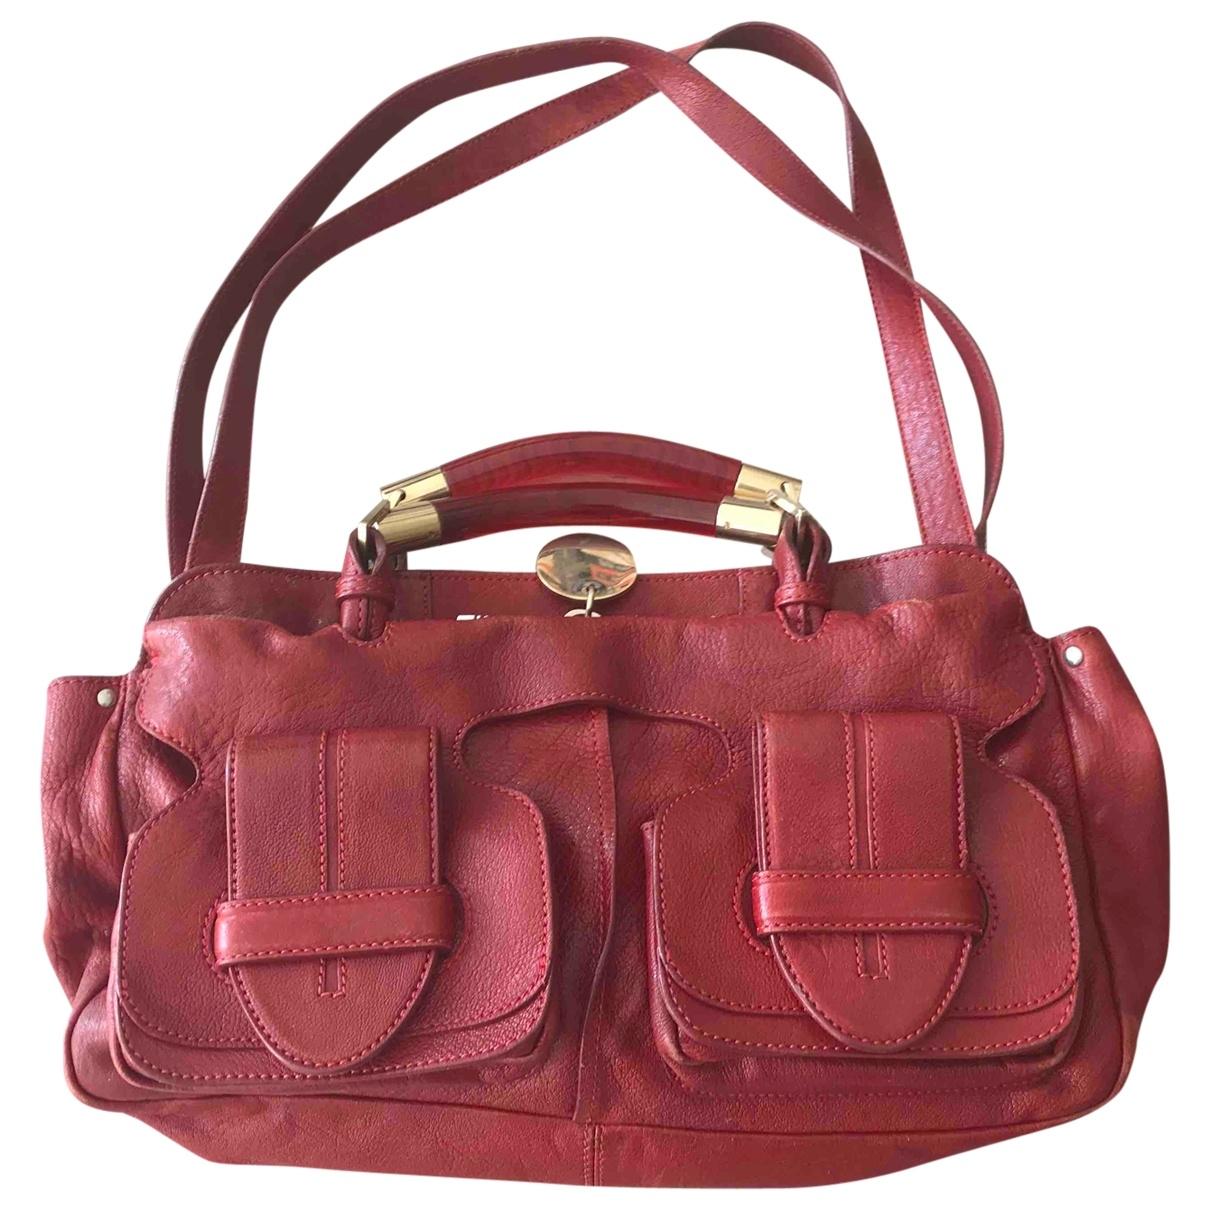 Chloe \N Handtasche in  Rot Leder